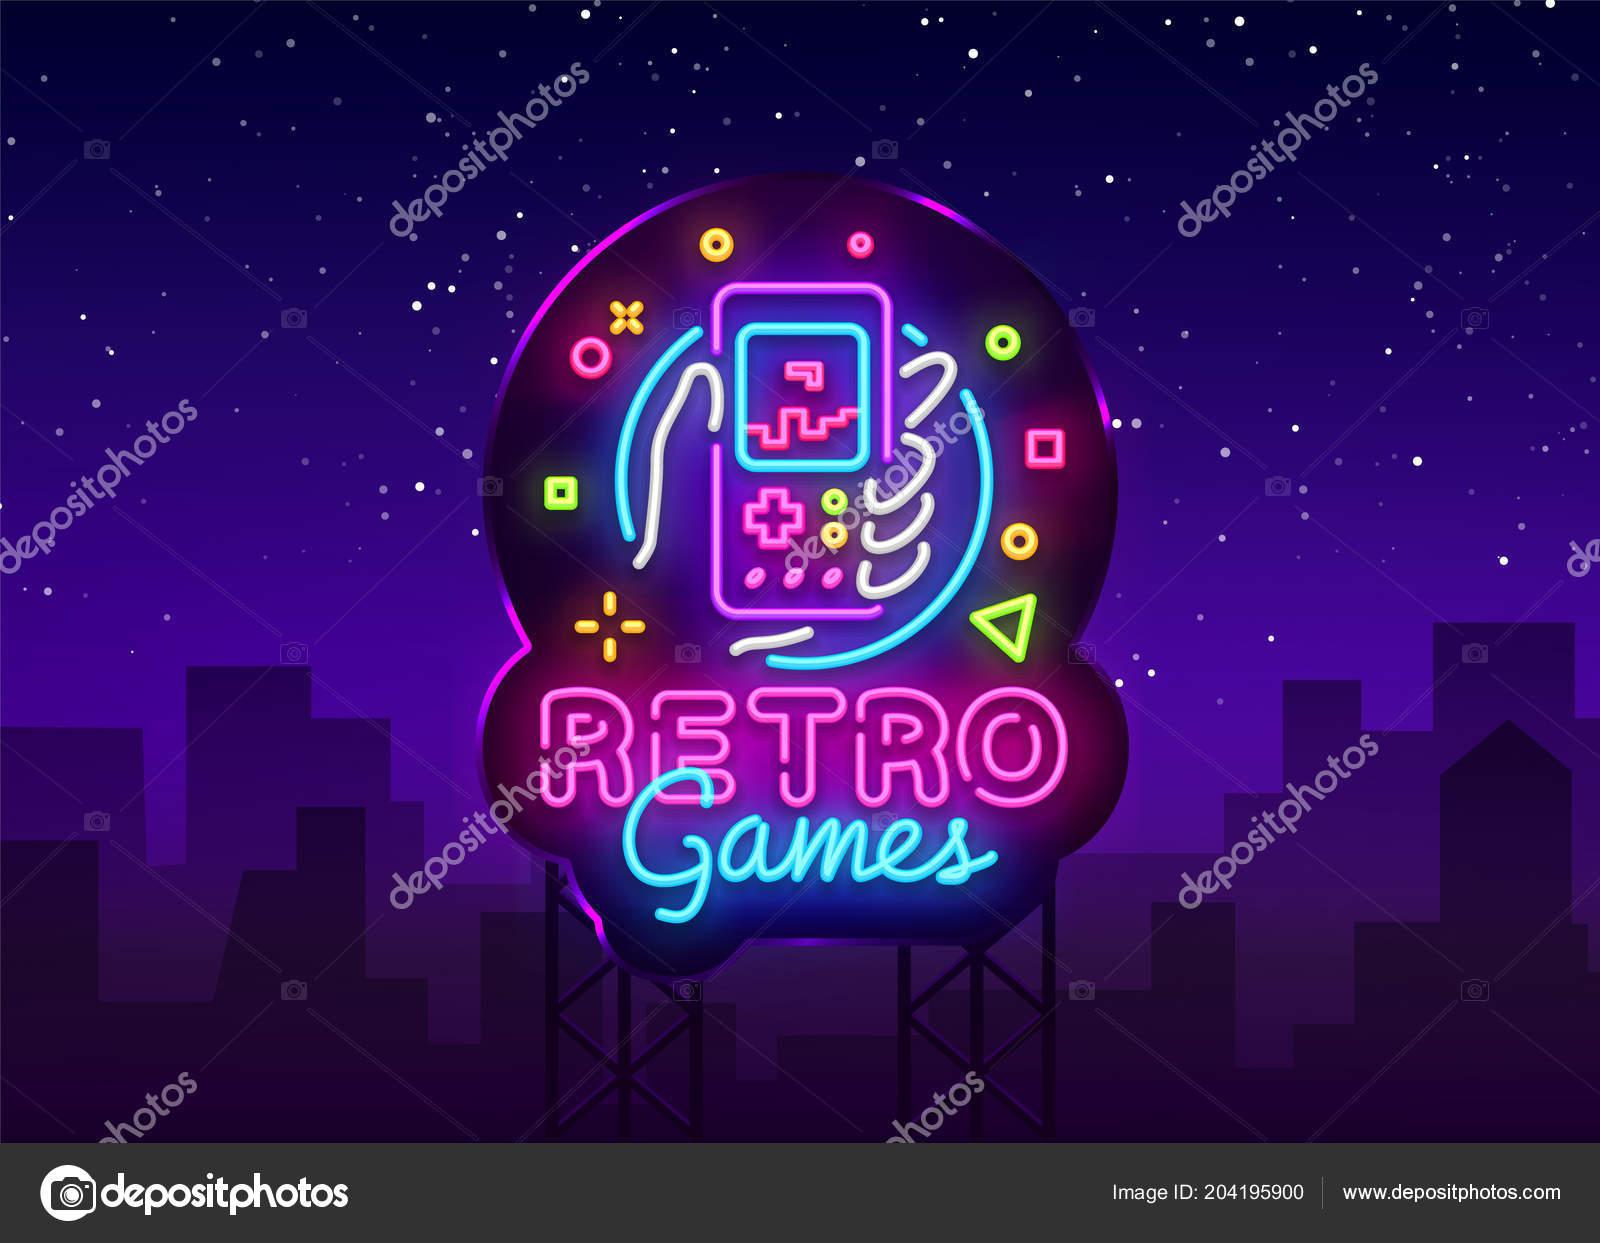 Retro Games Vector Logo  Retro geek gaming gamepad in hand